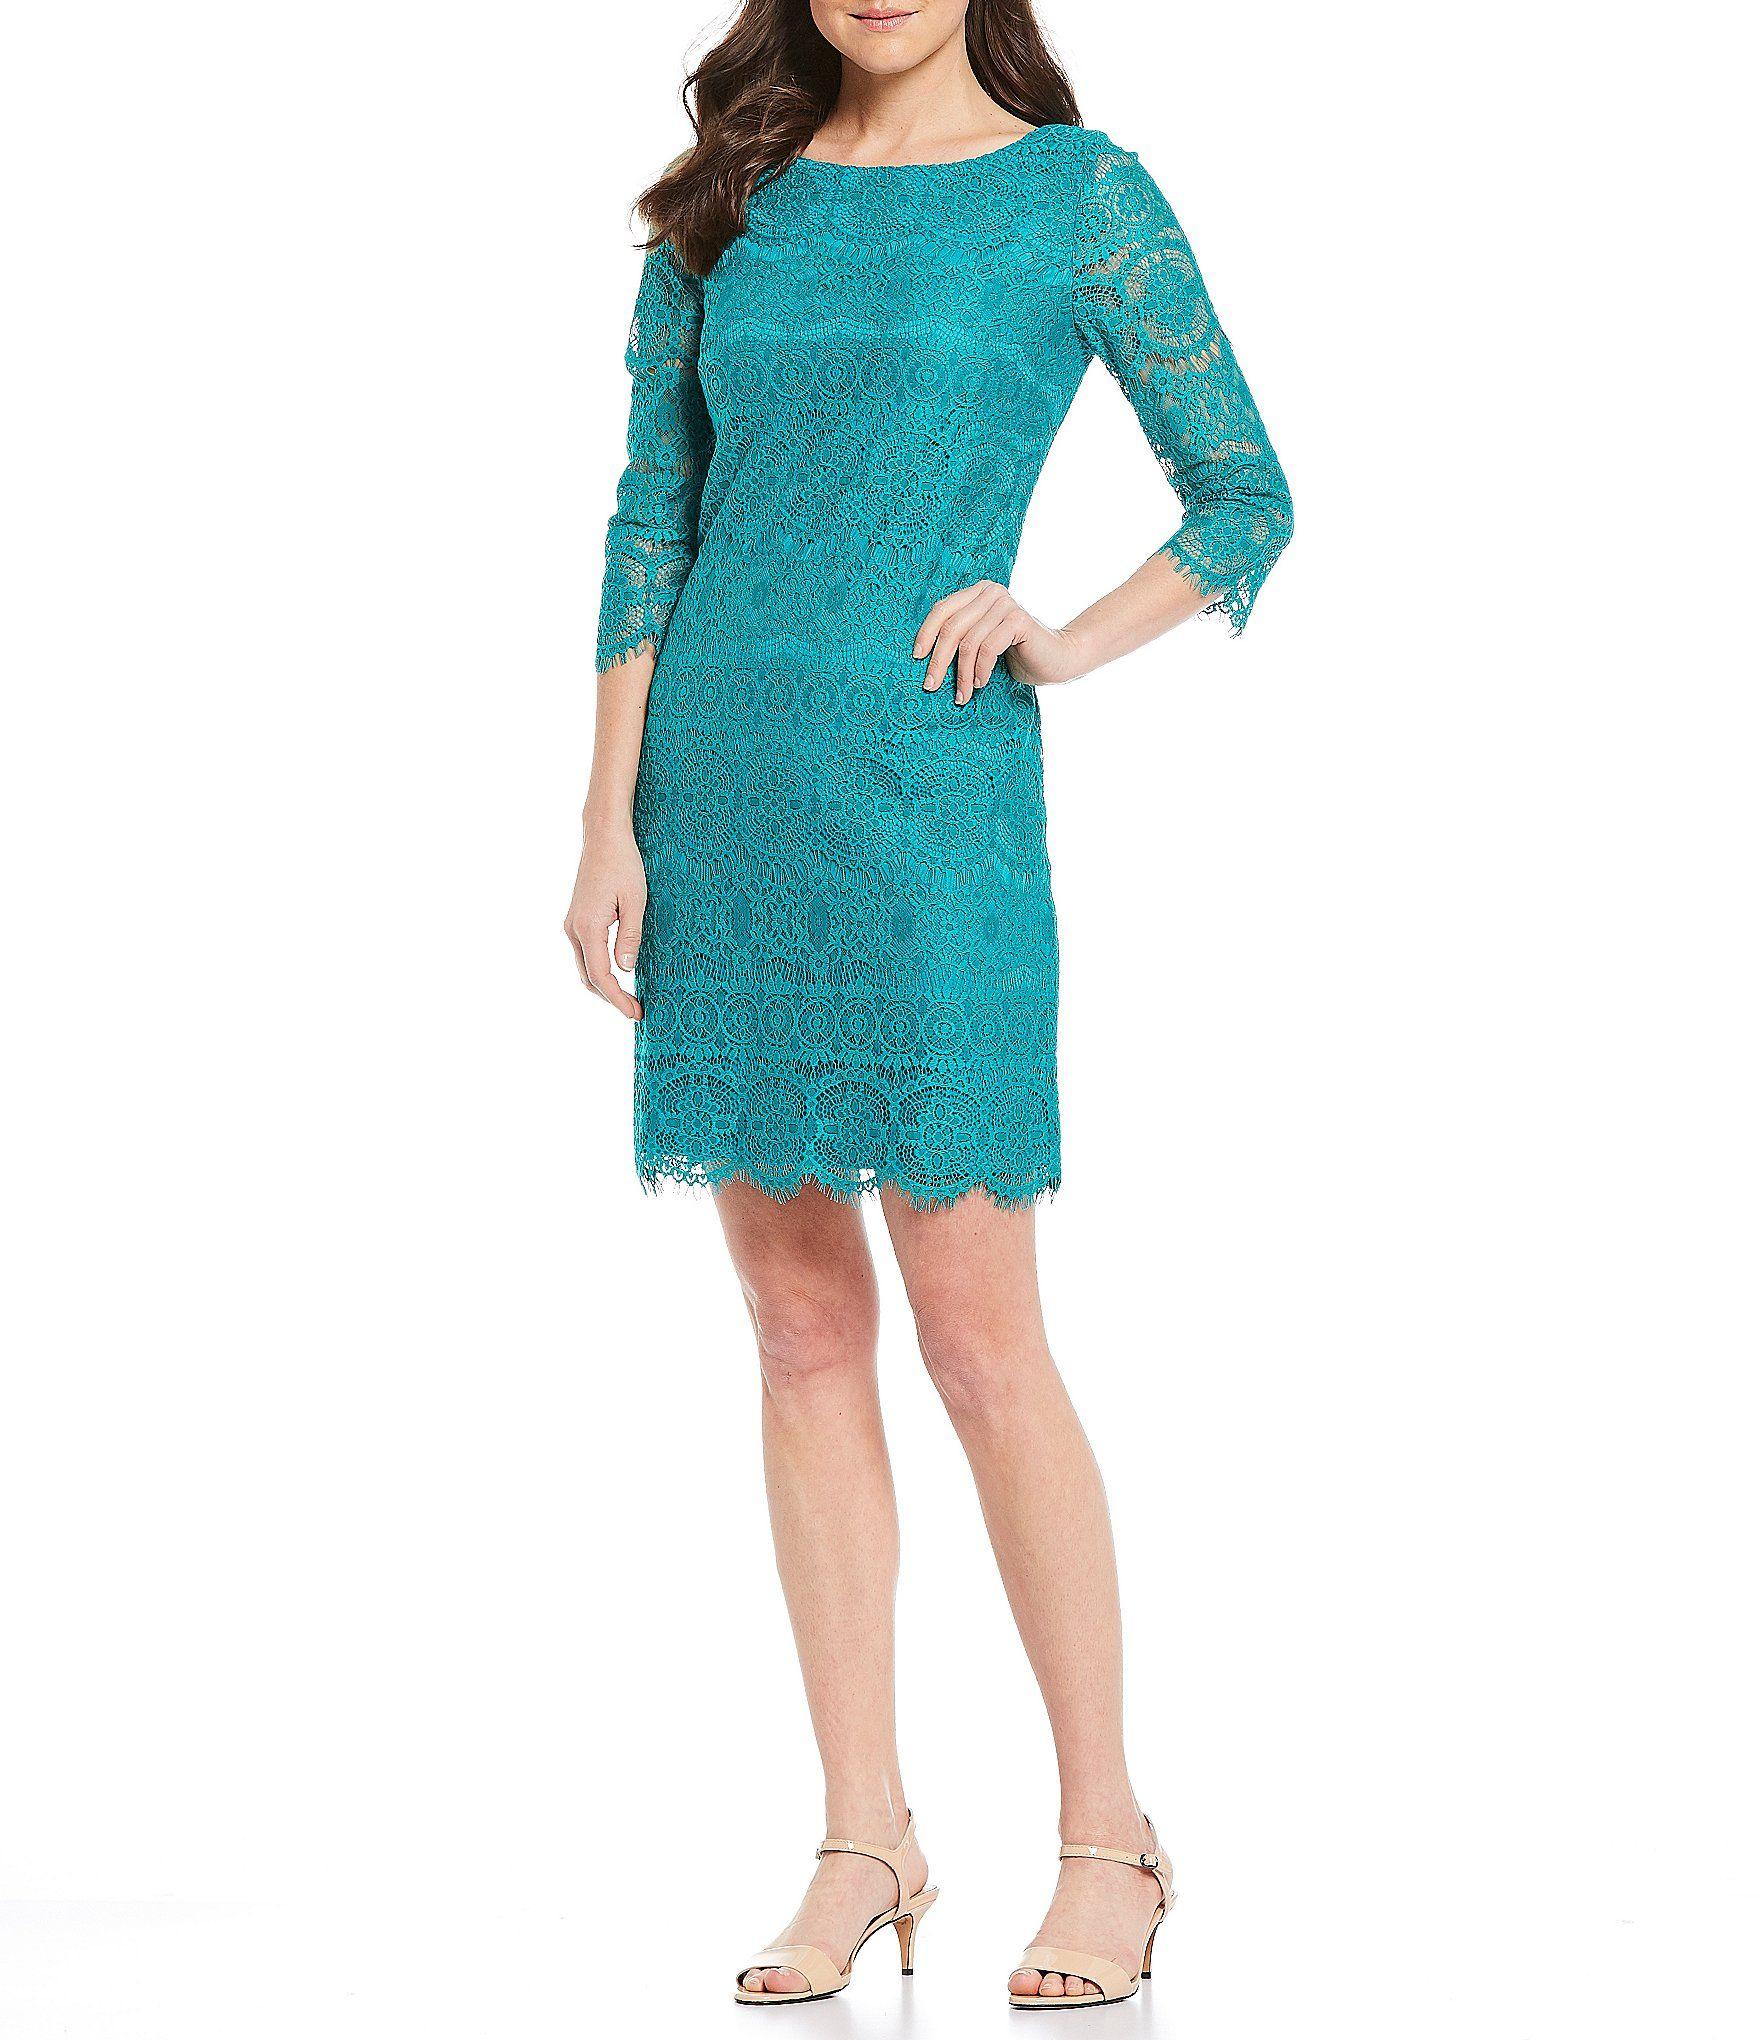 Jessica Howard Scalloped Lace 3 4 Sleeve Shift Dress Dillards Shift Dress Dresses Casual Dresses [ 2040 x 1760 Pixel ]